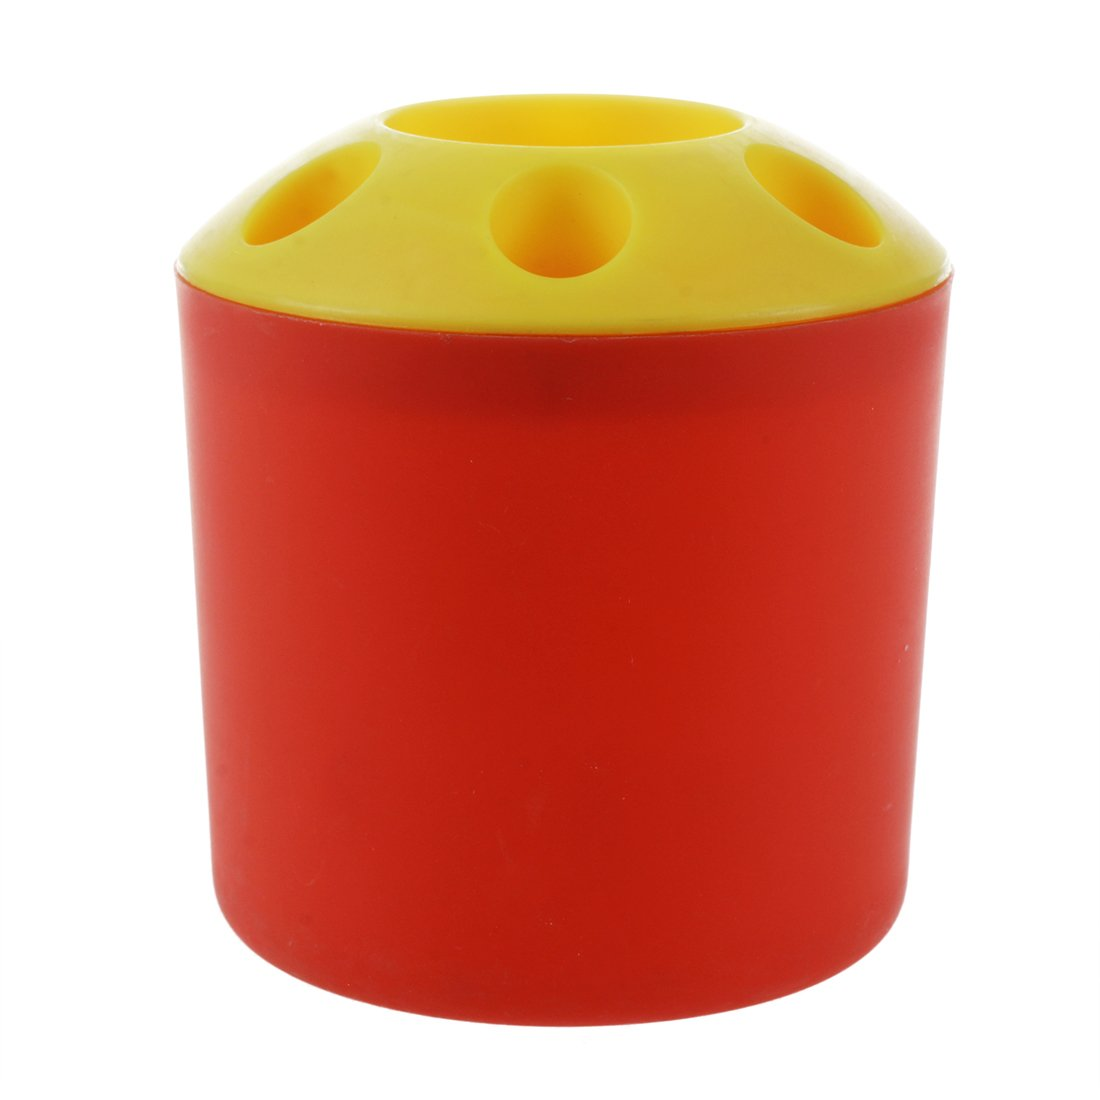 SODIAL(R) 1PCS Multifunctional 6 Holes Plastic Toothbrush Pen holder Storage Box£¨green£© LEPAZIK3684